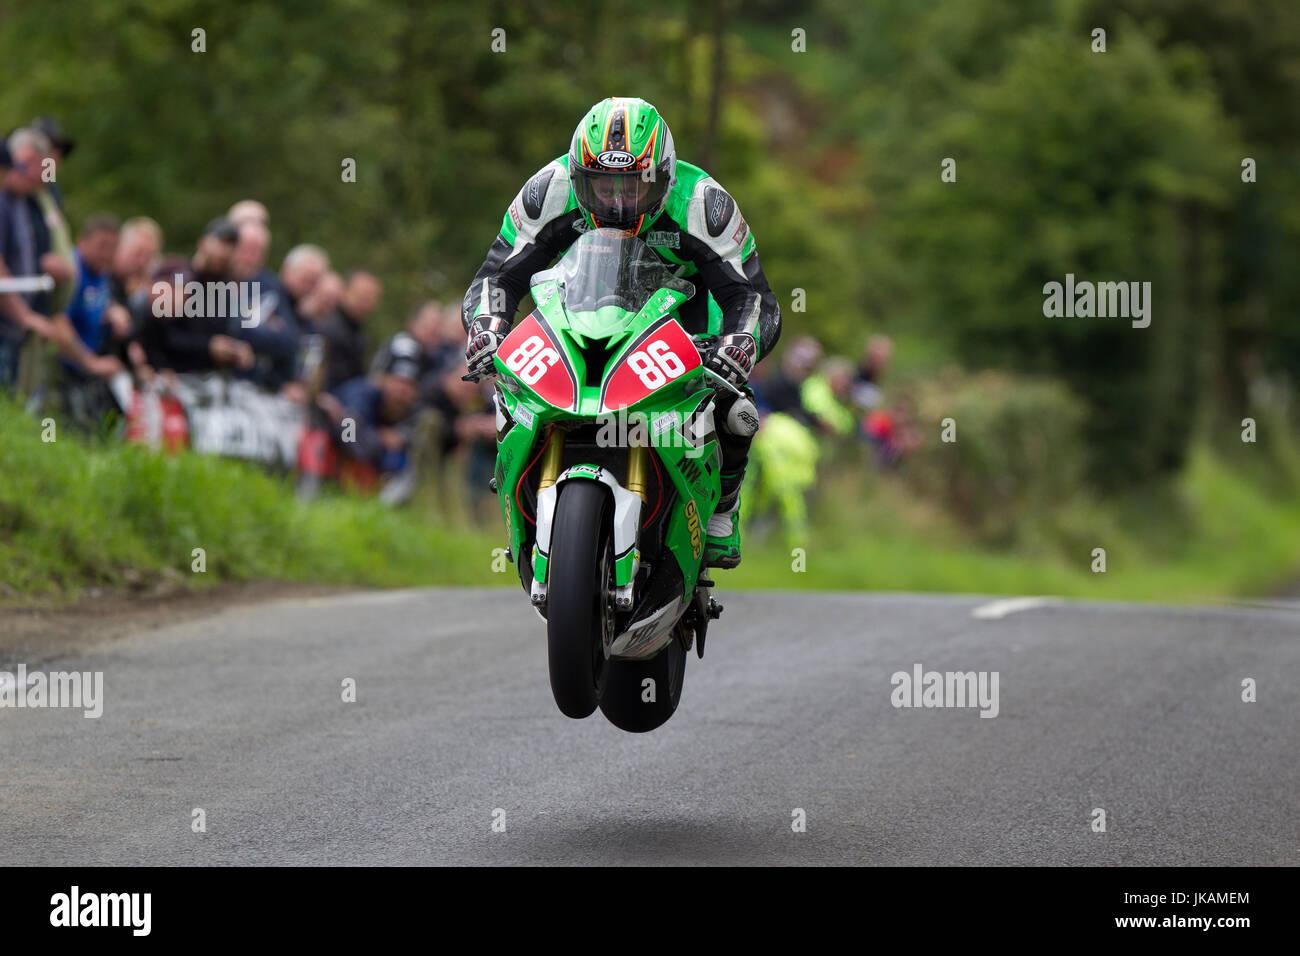 Derek McGee, Armoy 'Race Of Legends' Road Races 2016 - Stock Image